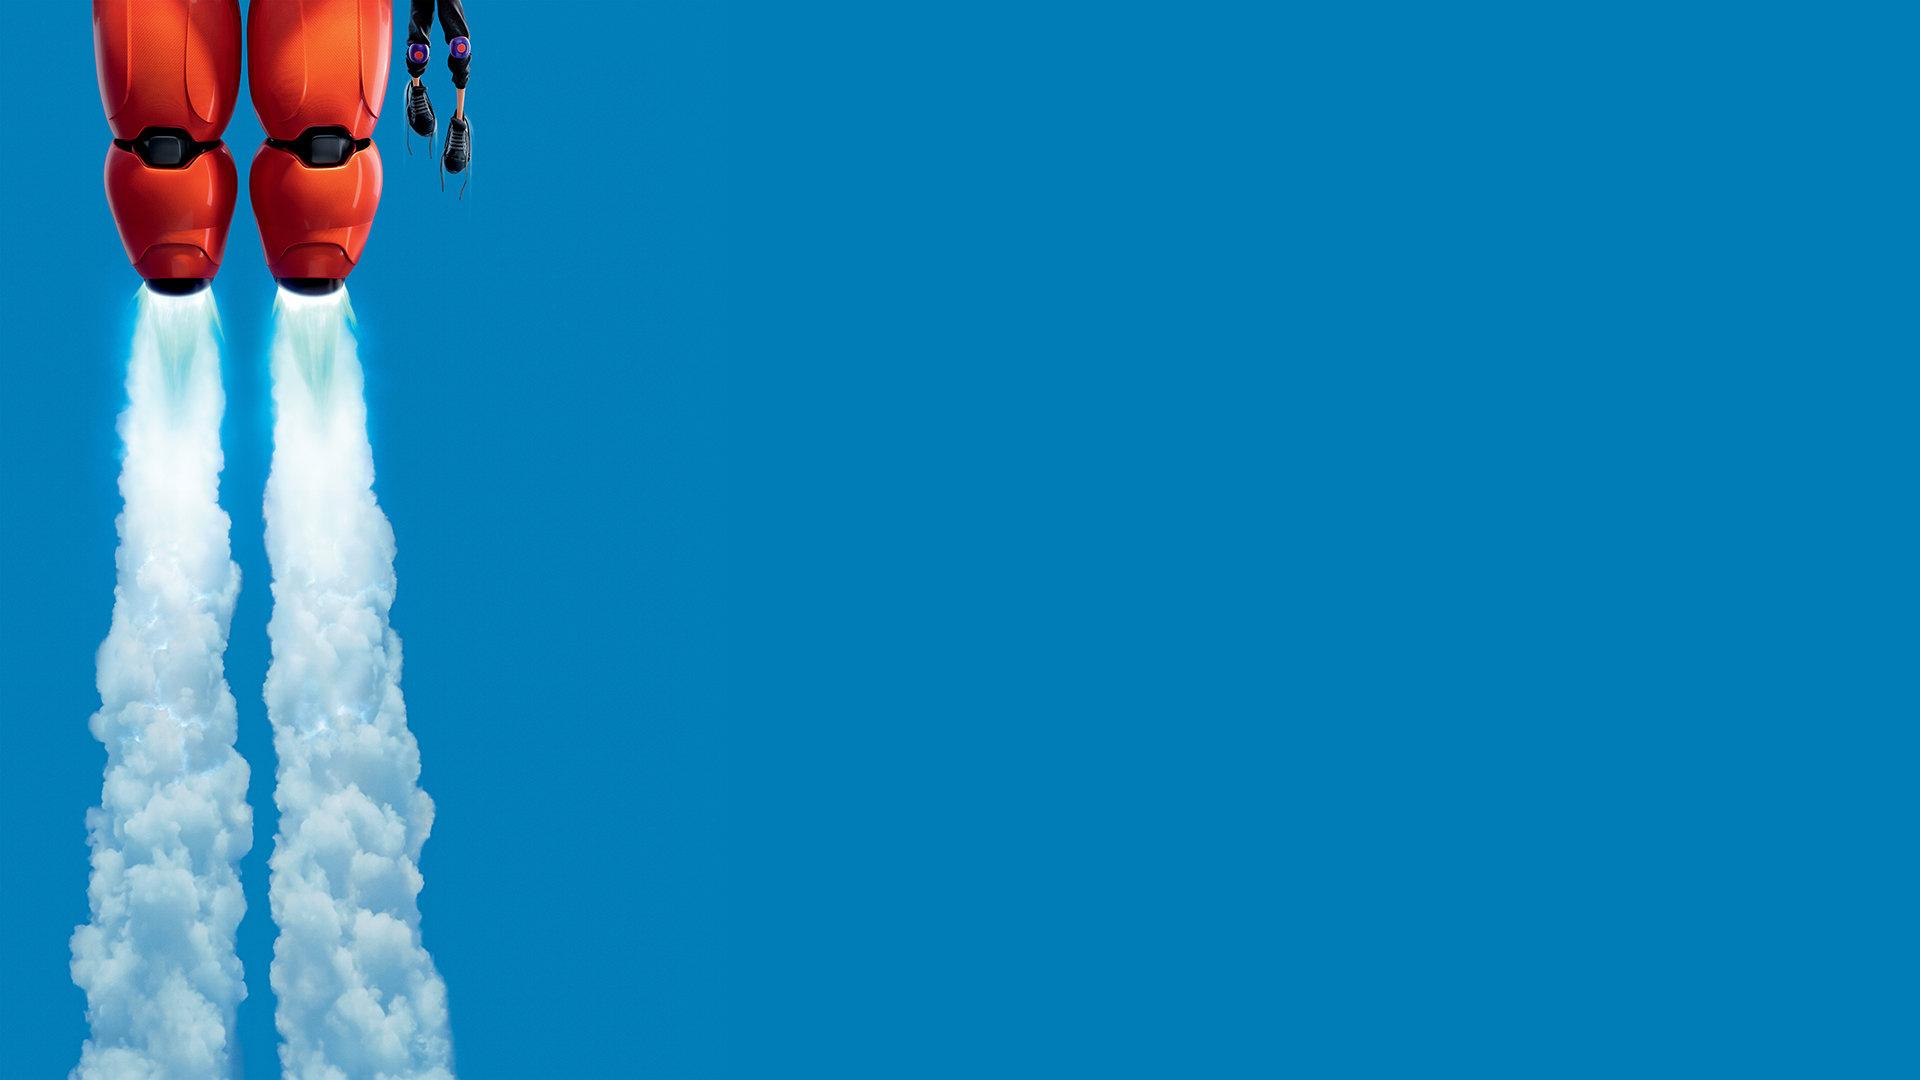 High Resolution Big Hero 6 Full Hd Wallpaper Id Big Hero 6 High Resolution 3133073 Hd Wallpaper Backgrounds Download